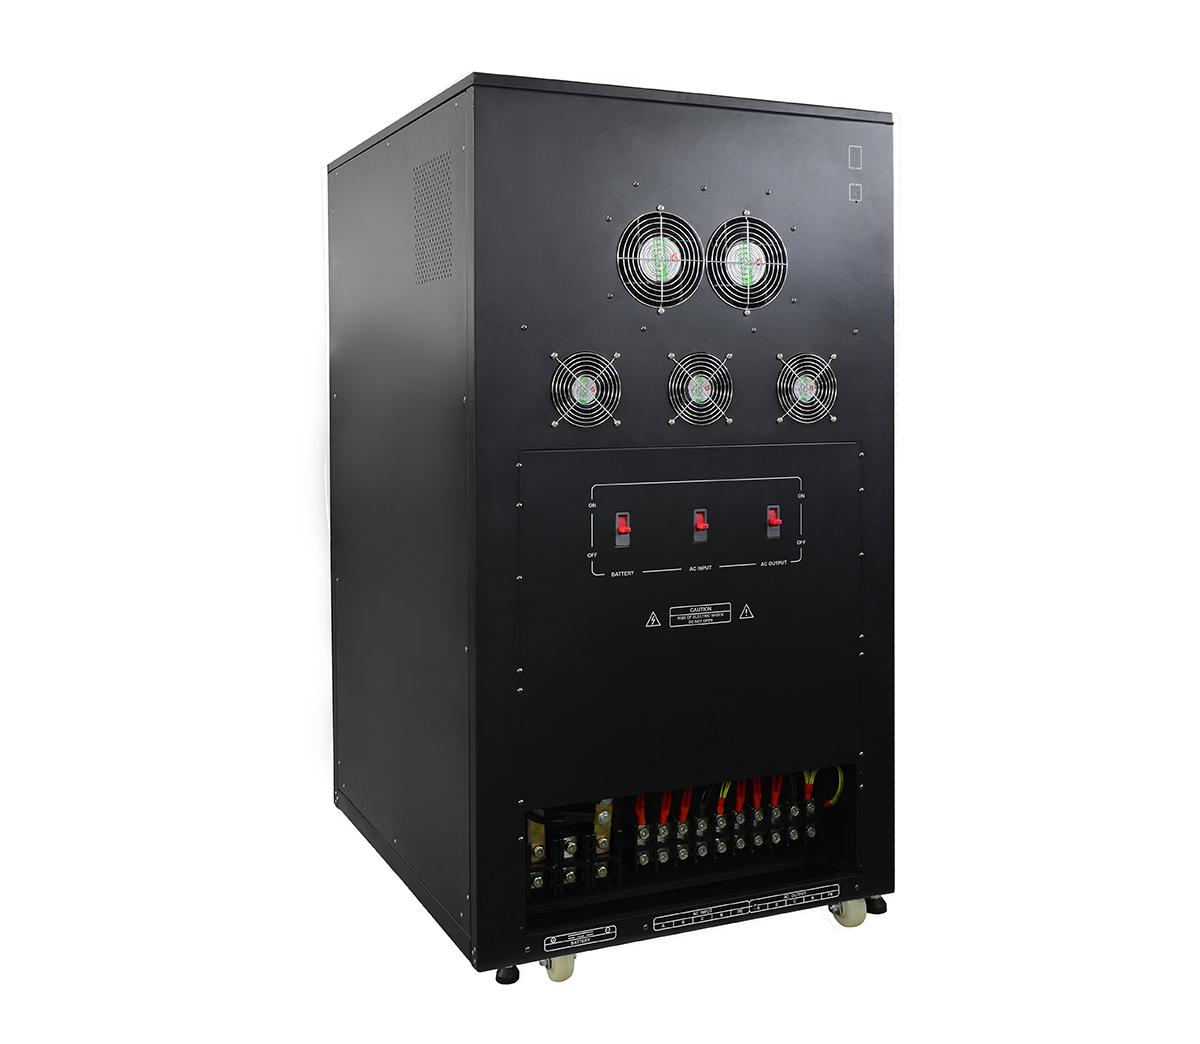 3 phase off grid inverter 100-150kva